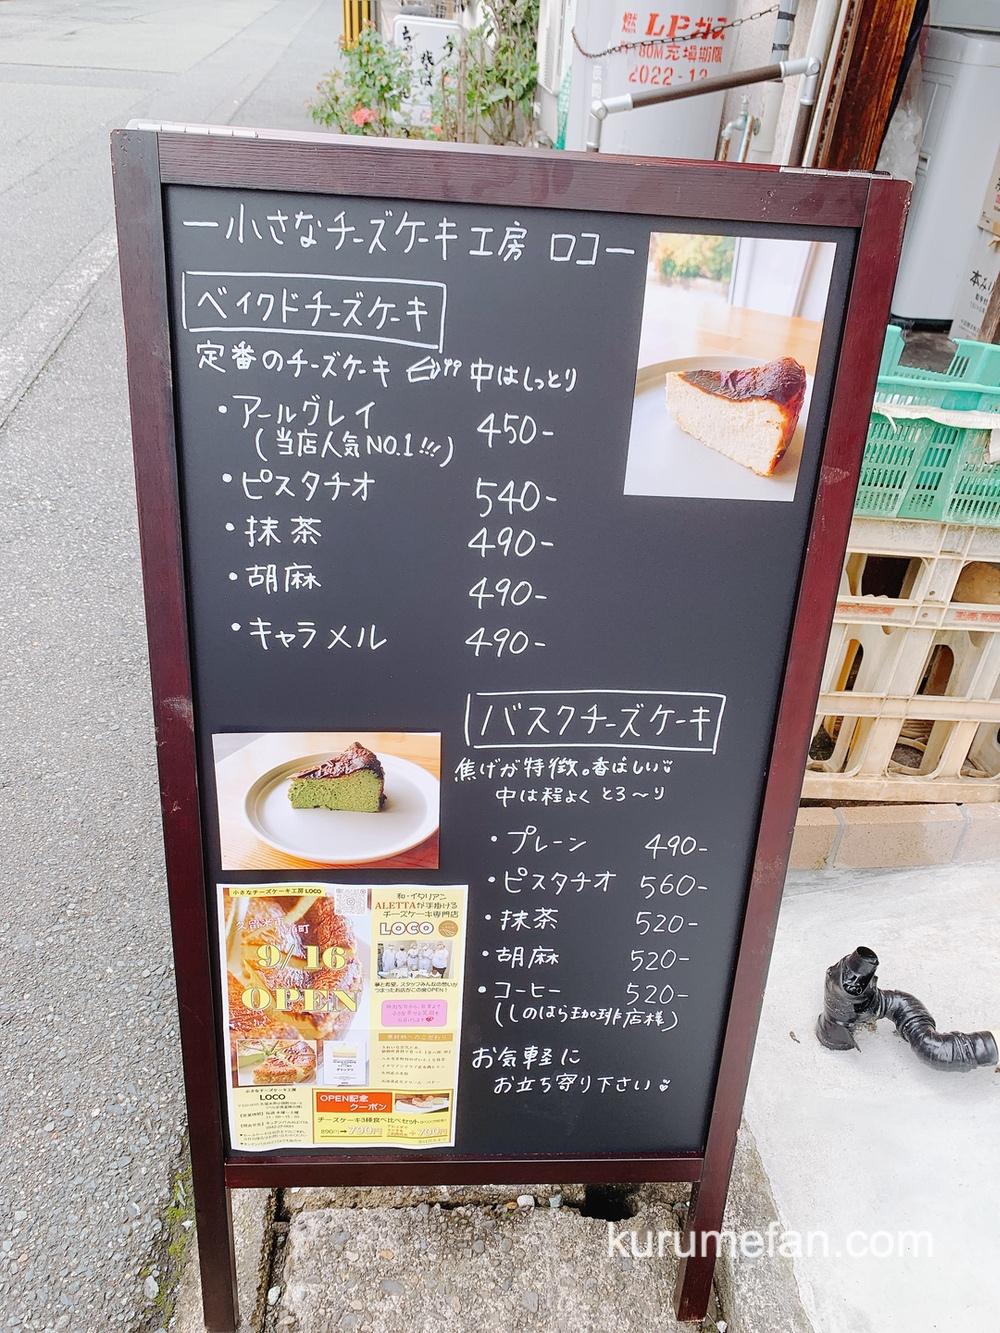 cheese cake LOCO チーズケーキメニュー表